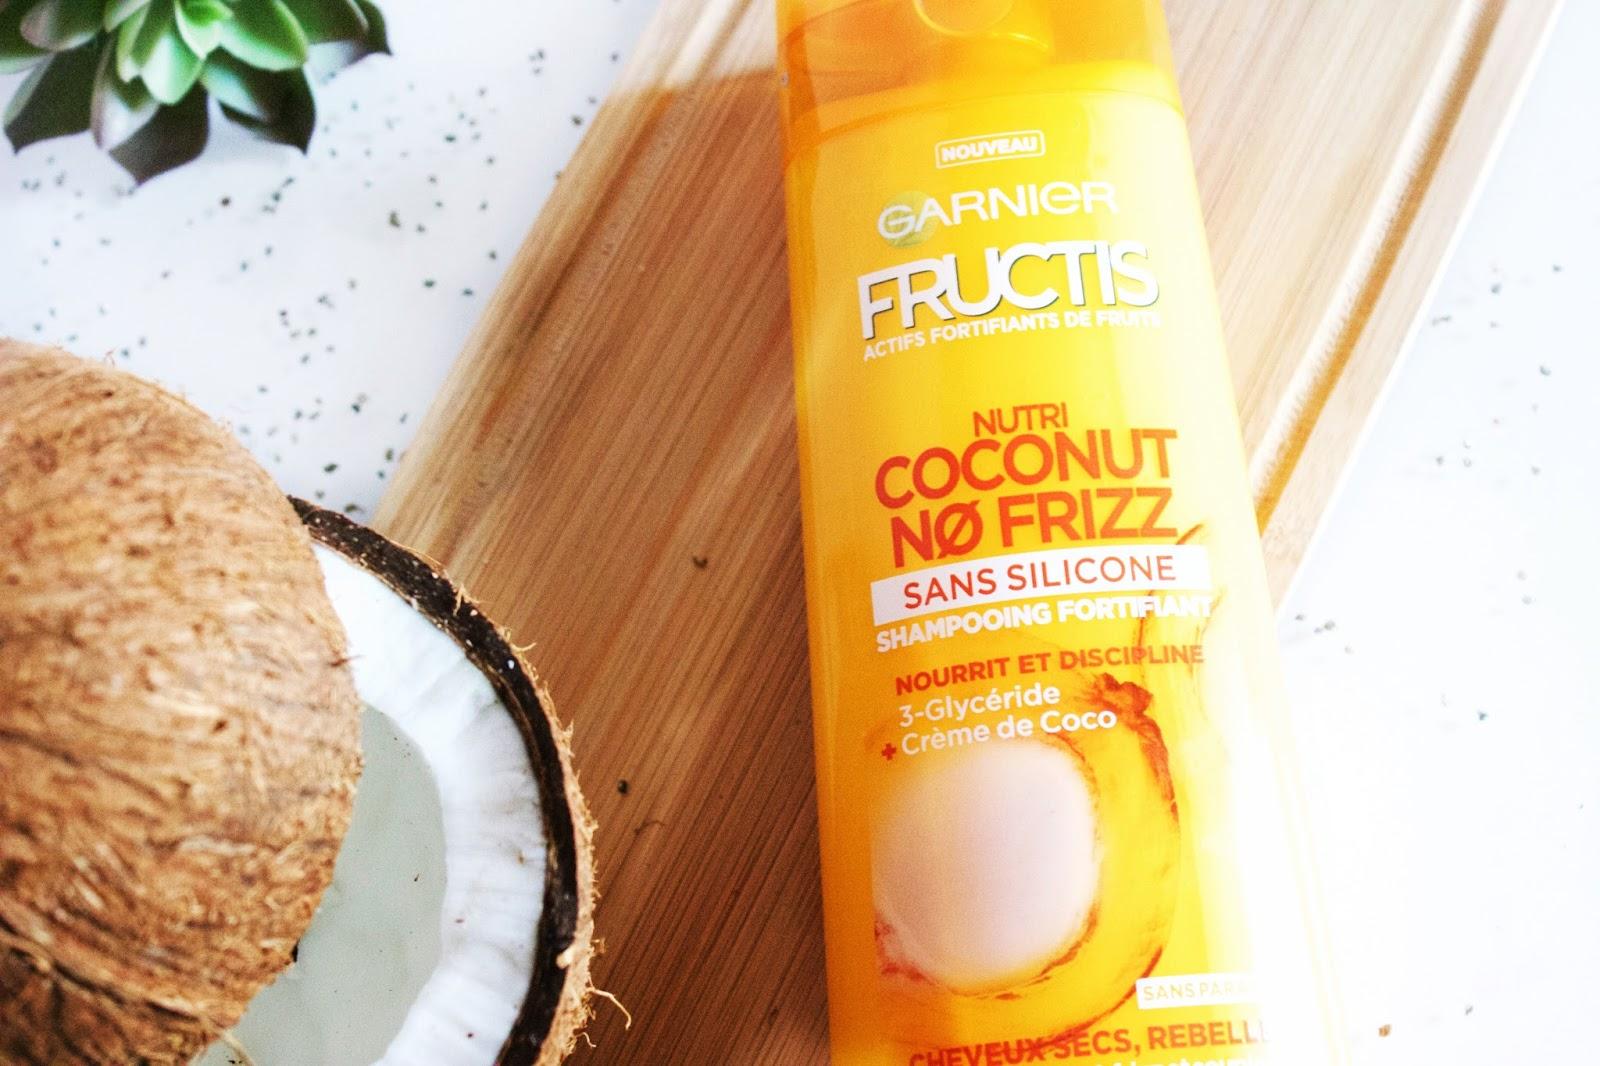 garnier-fructis-nutri-coconut-no-frizz